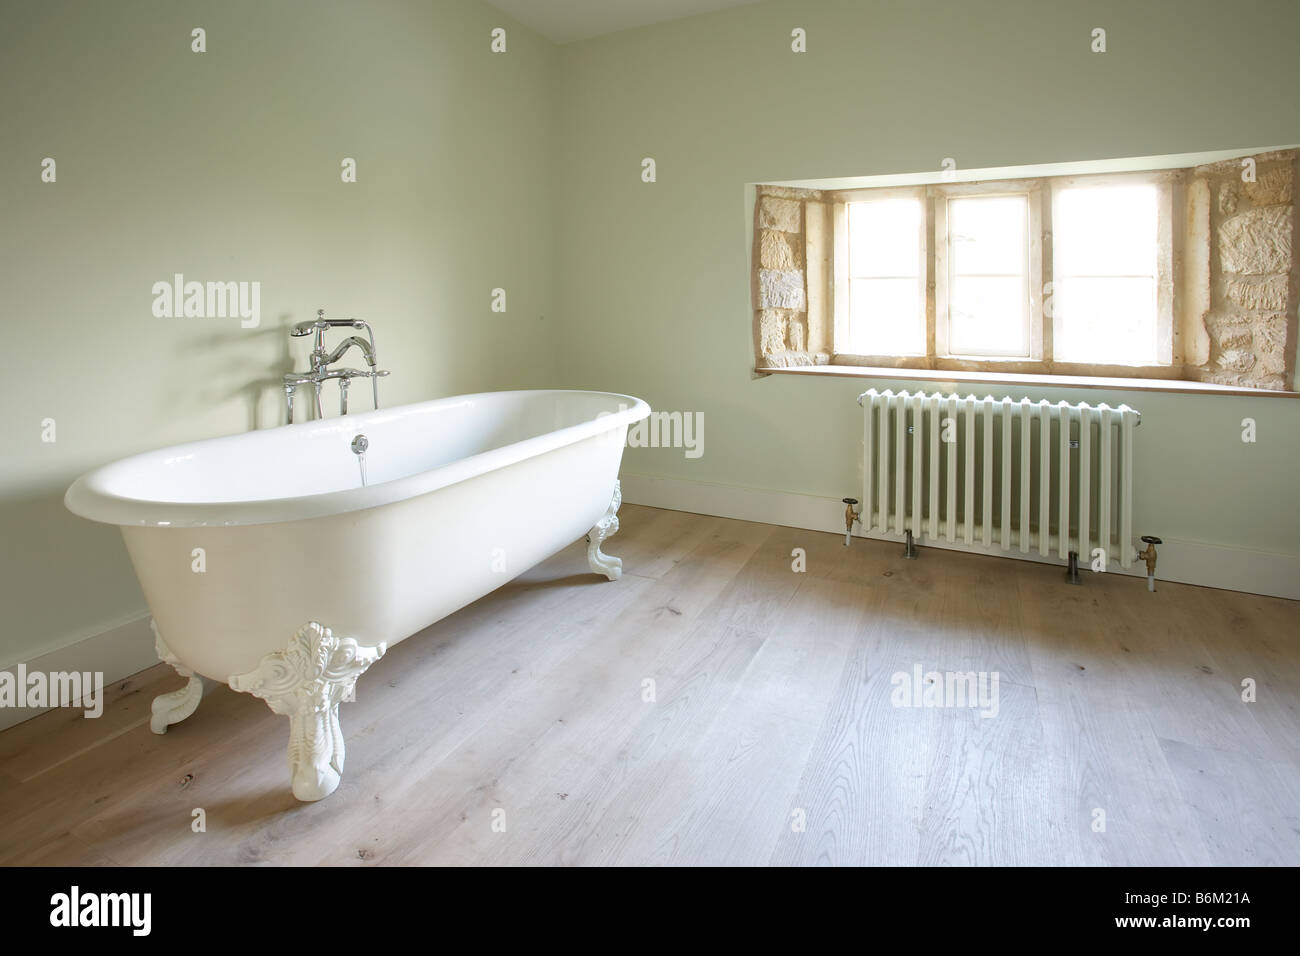 Bath in the bathroom) 86